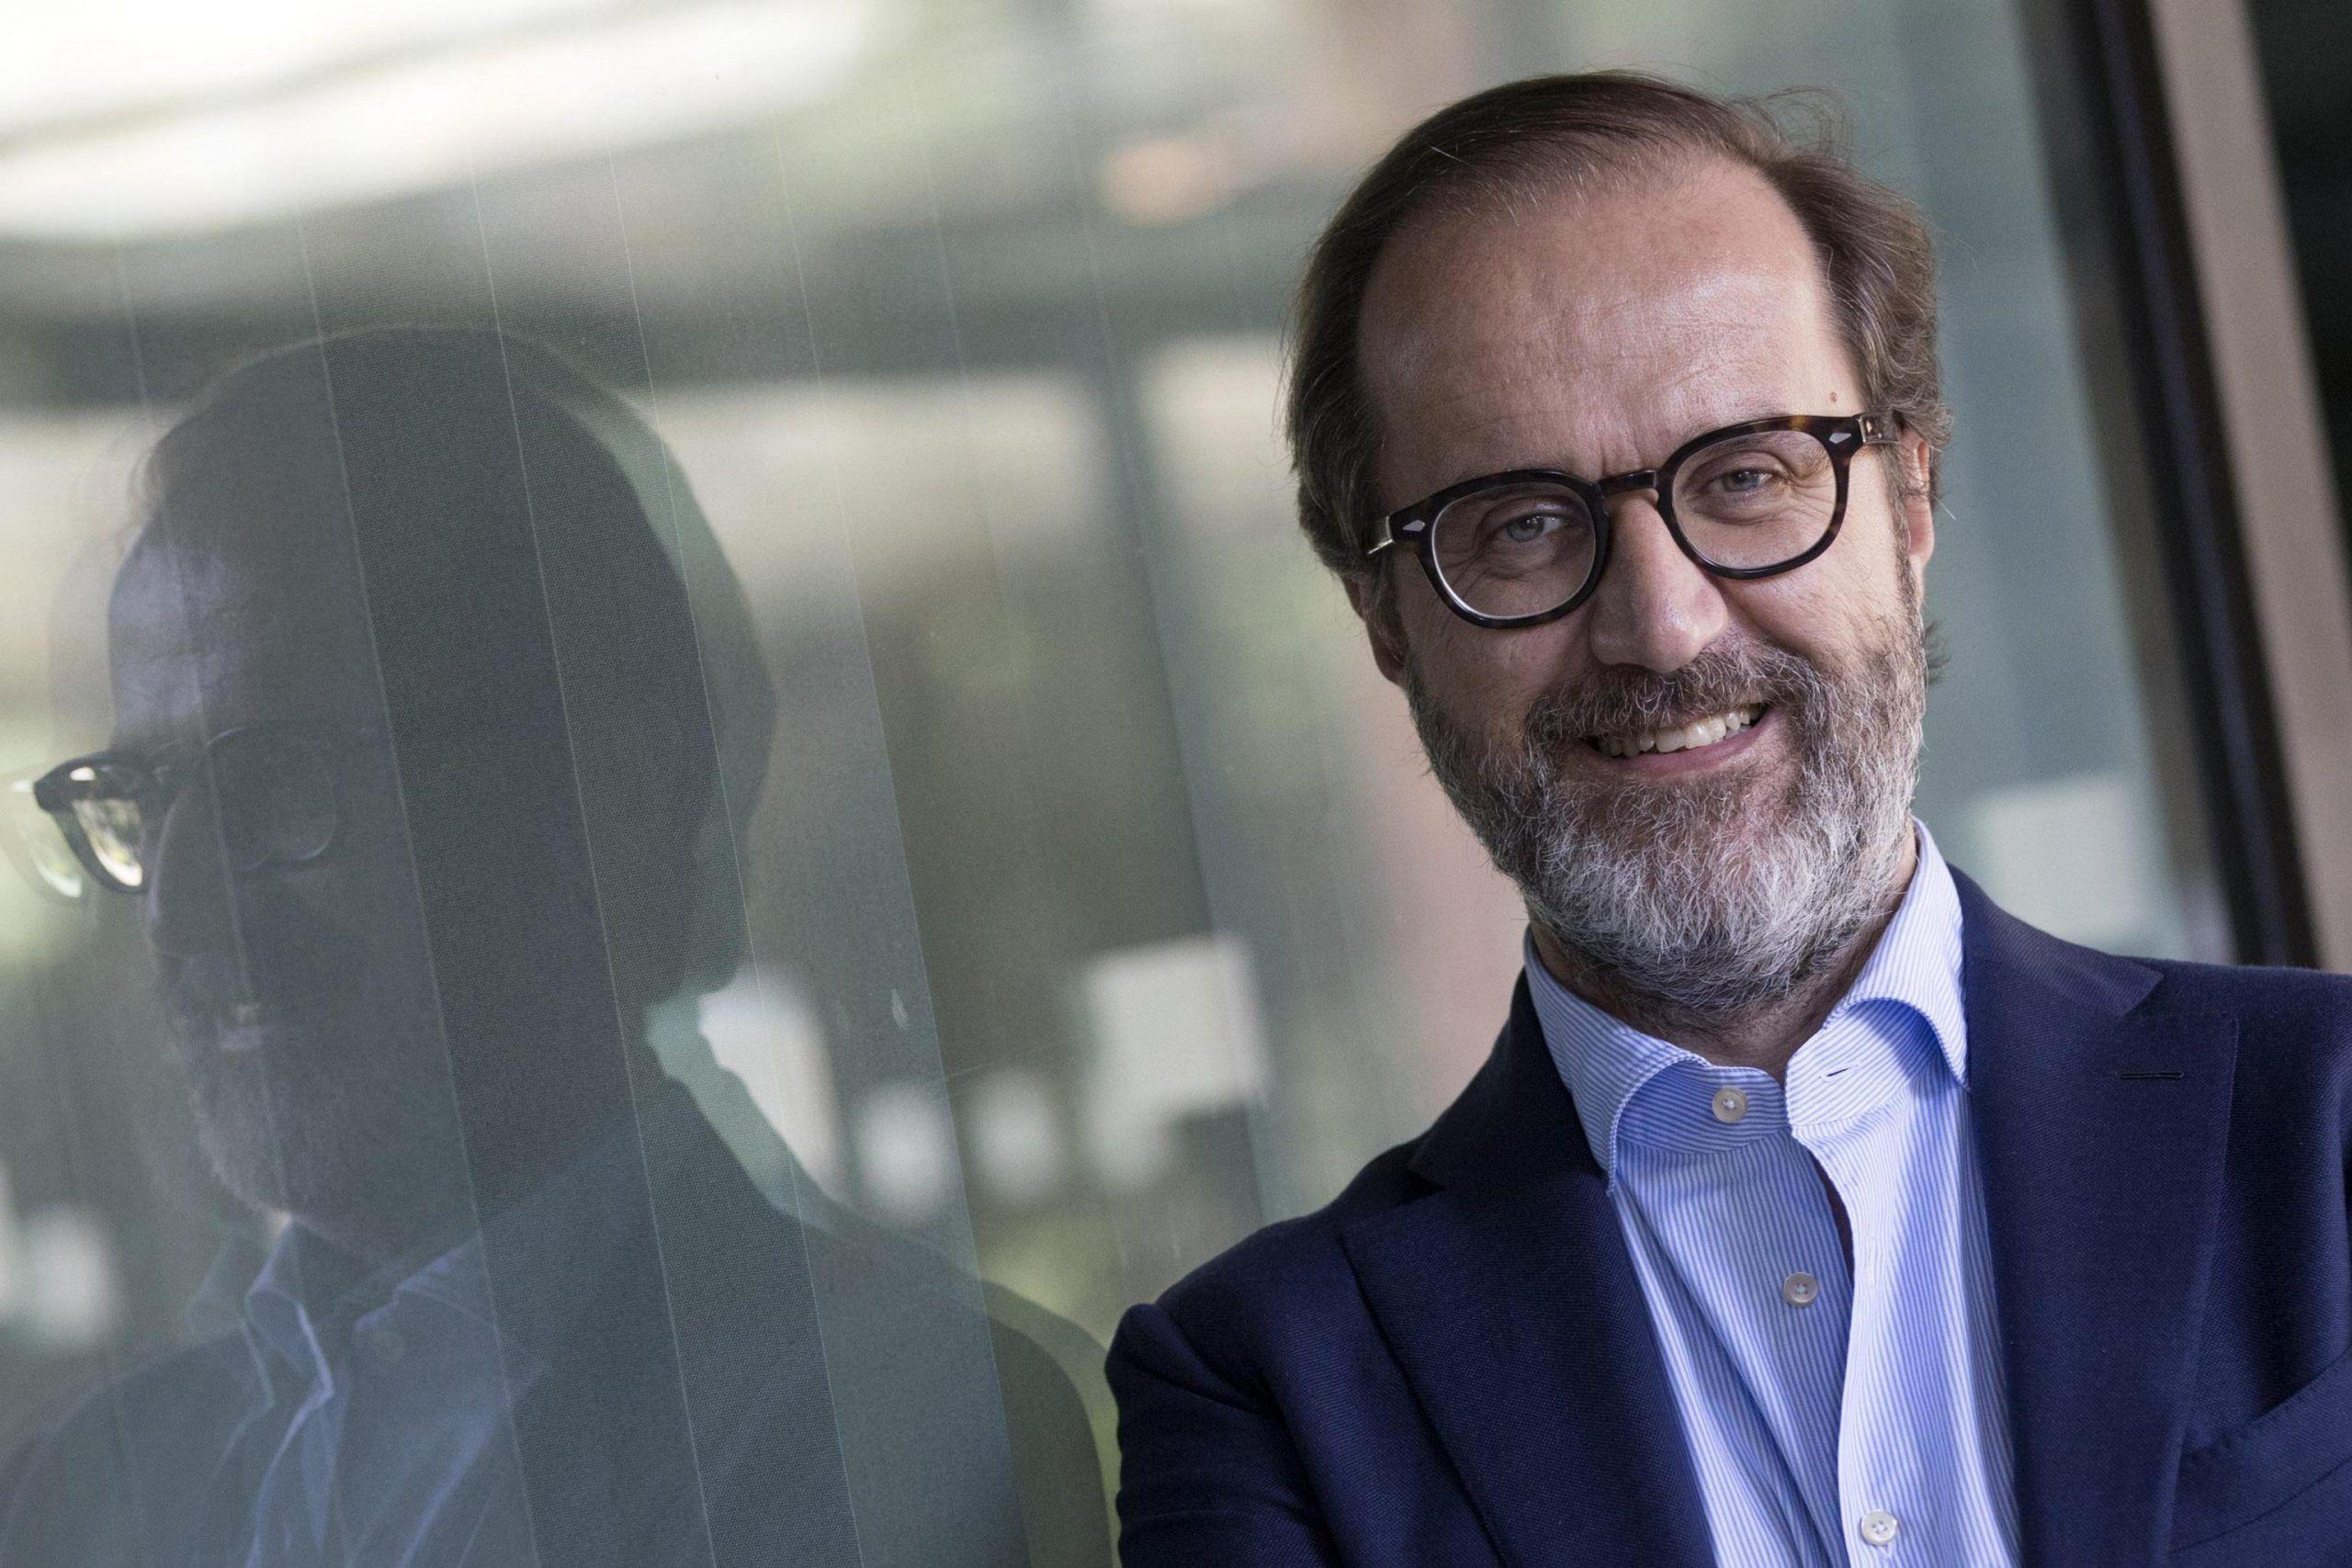 Stefano Coletta direttore di Rai 3 al posto di Daria Bignardi